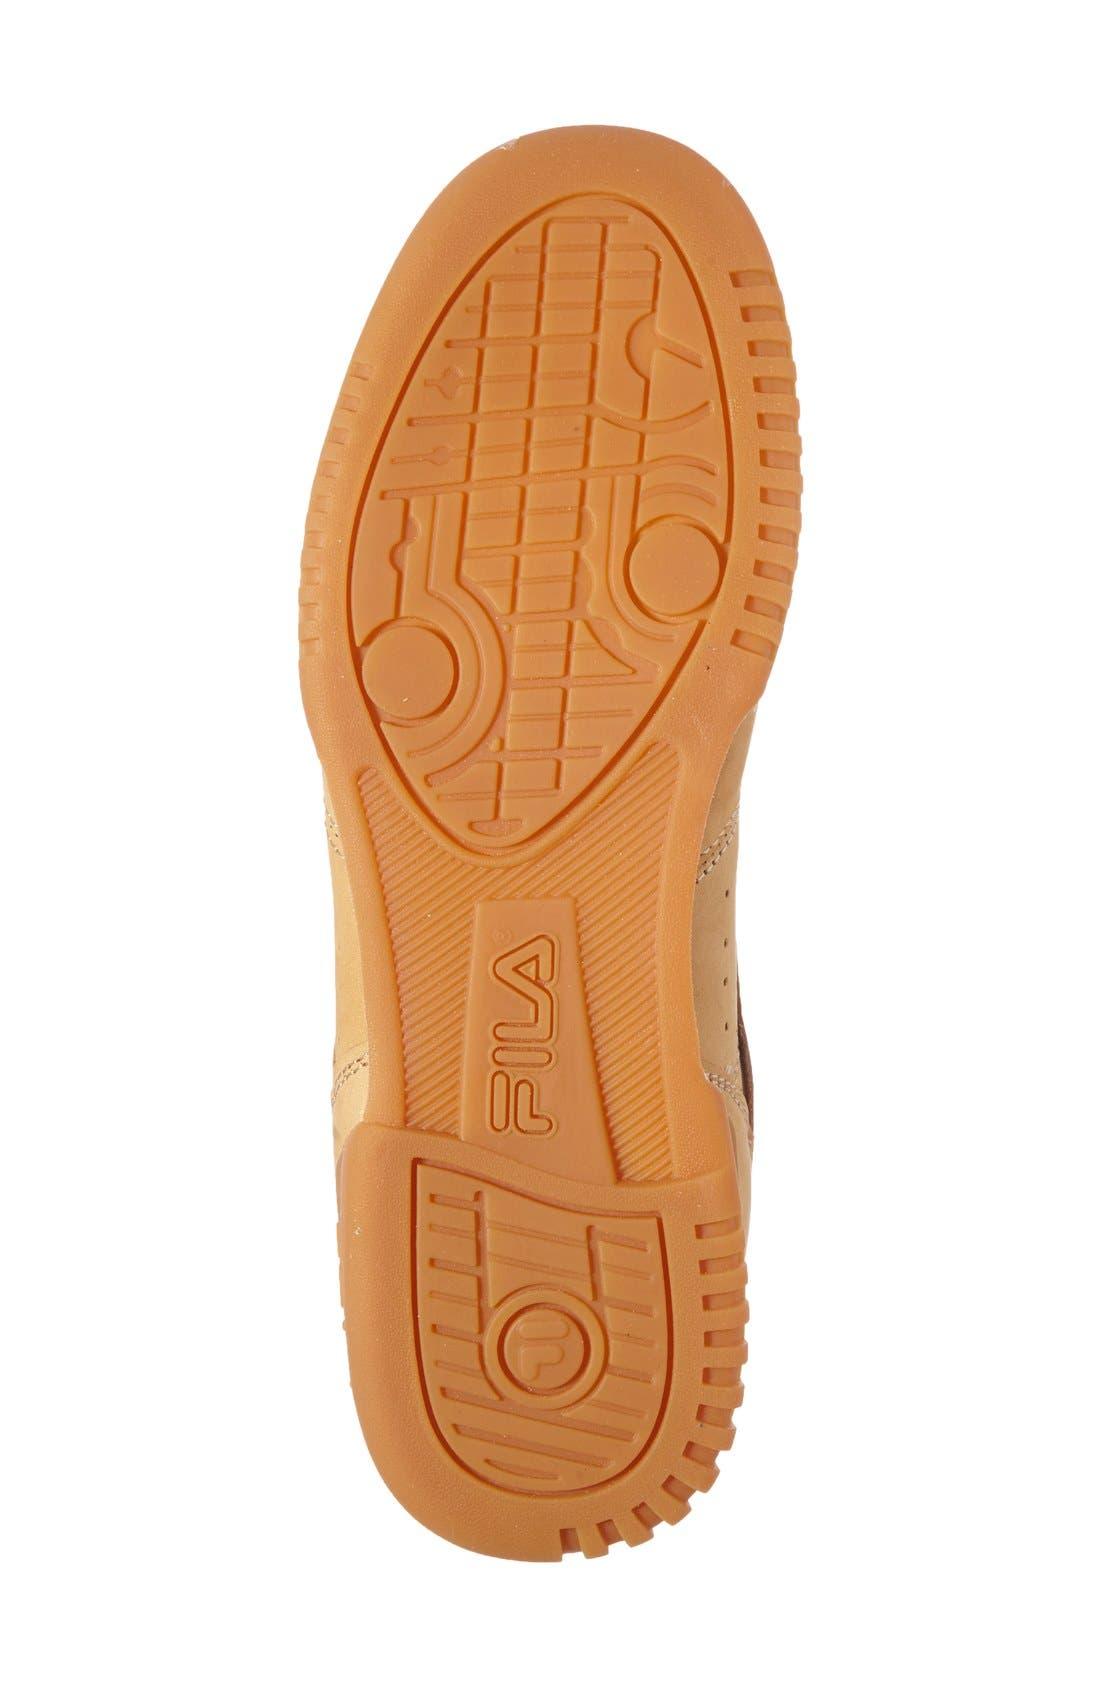 USA Heritage Sneaker,                             Alternate thumbnail 4, color,                             Tan Nubuck Leather